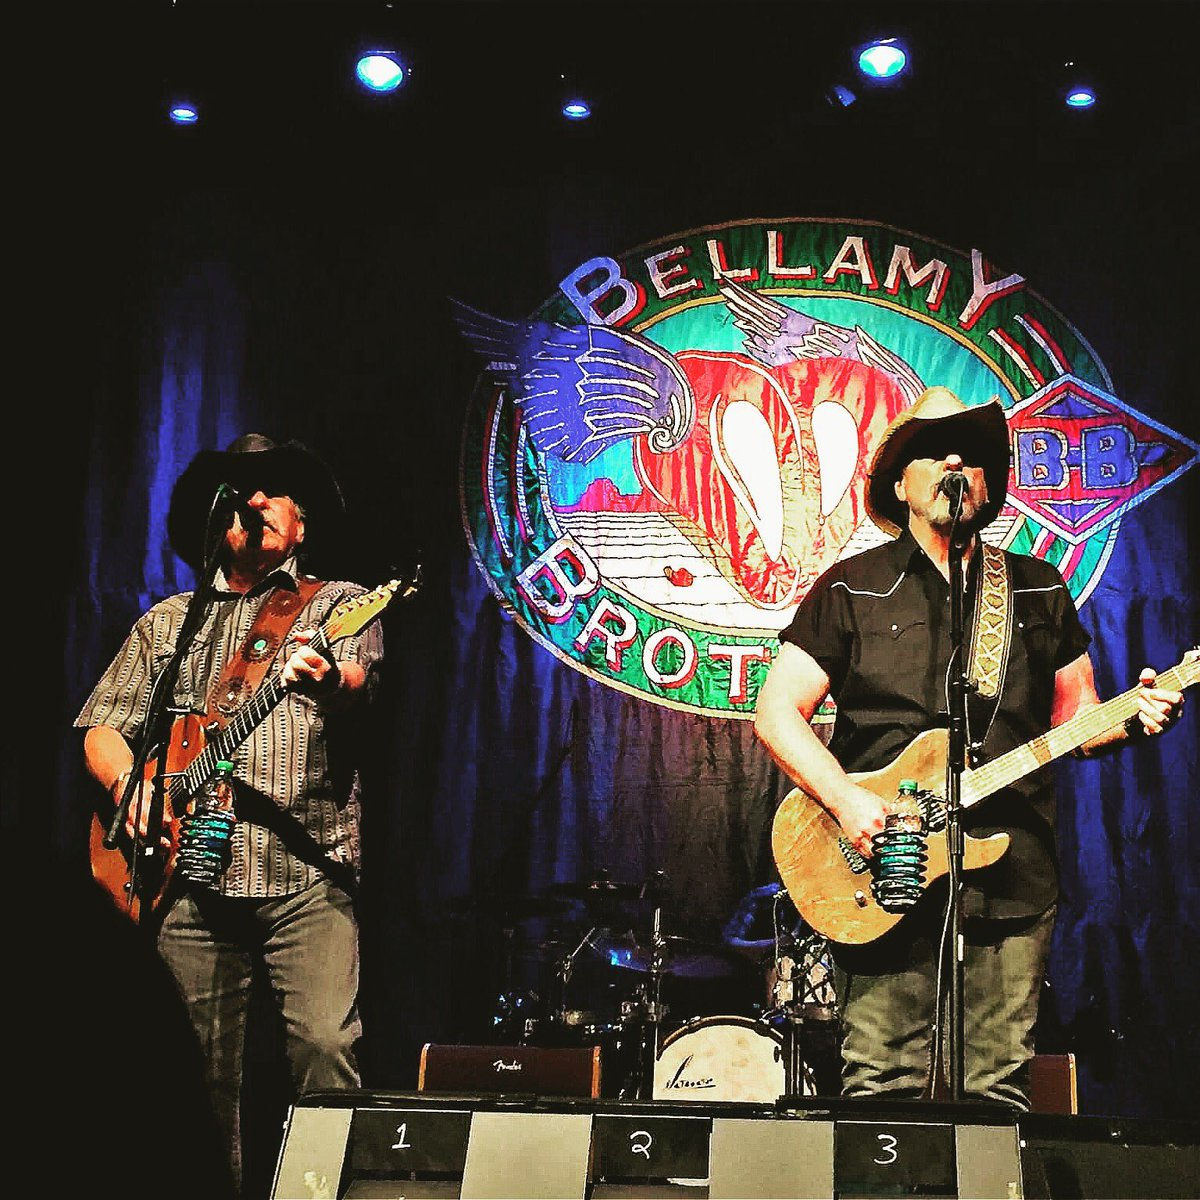 BellamyBrothers photo